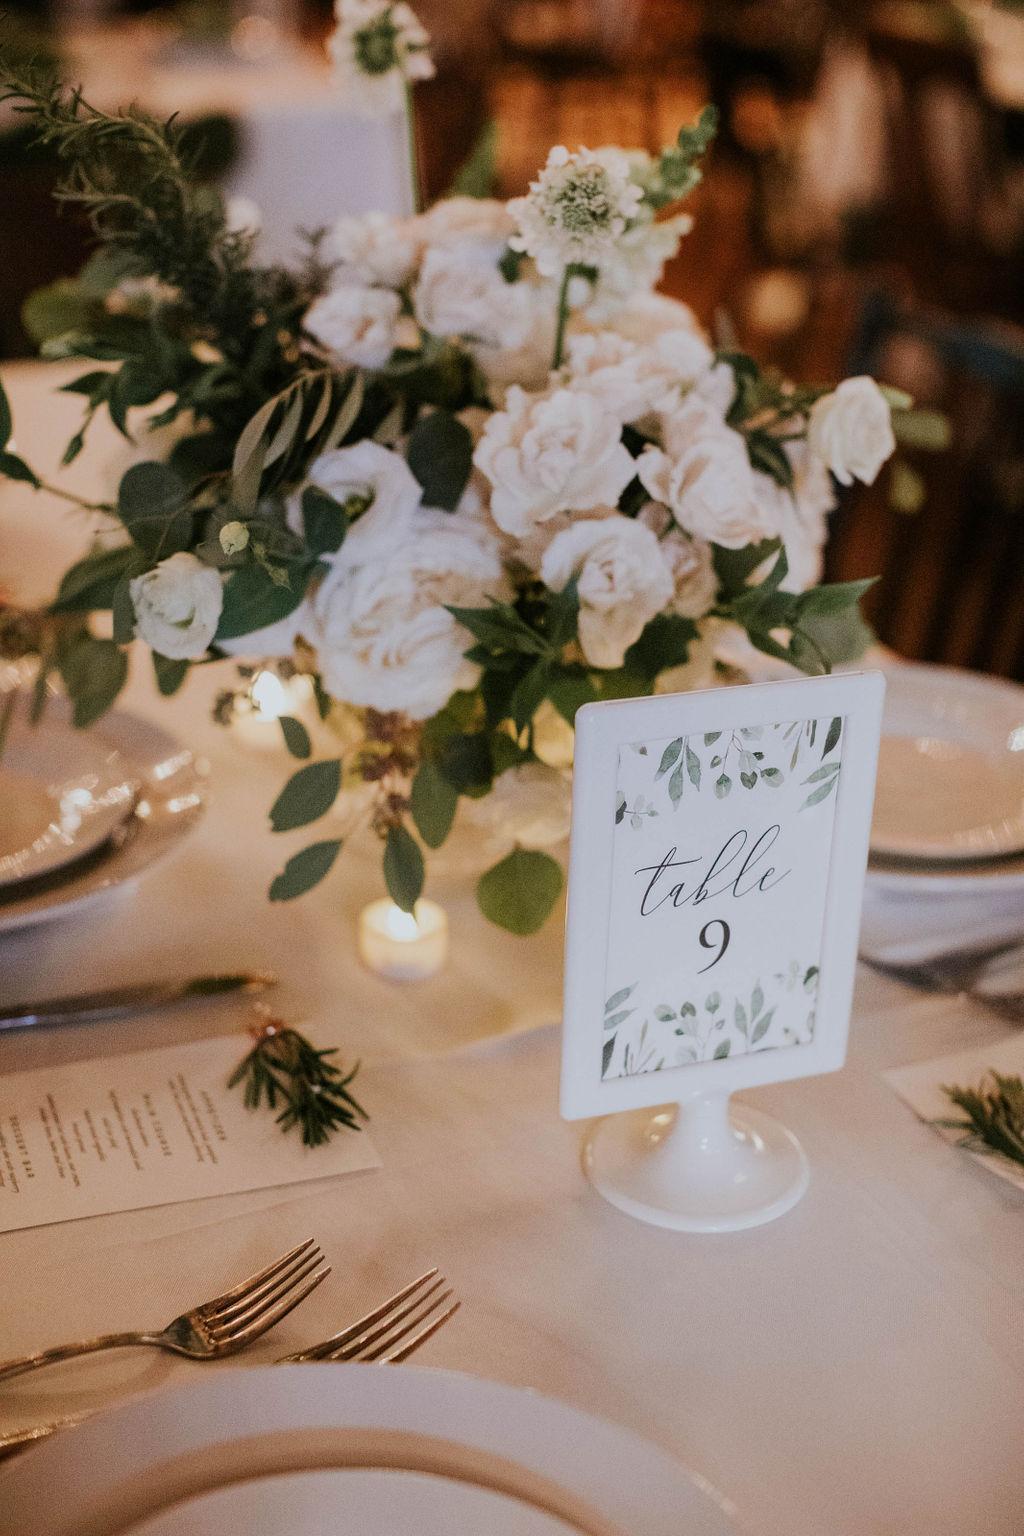 tablescape compote floral design white wedding flowers white table flowers wedding centerpieces richmond wedding florist virginia wedding florist